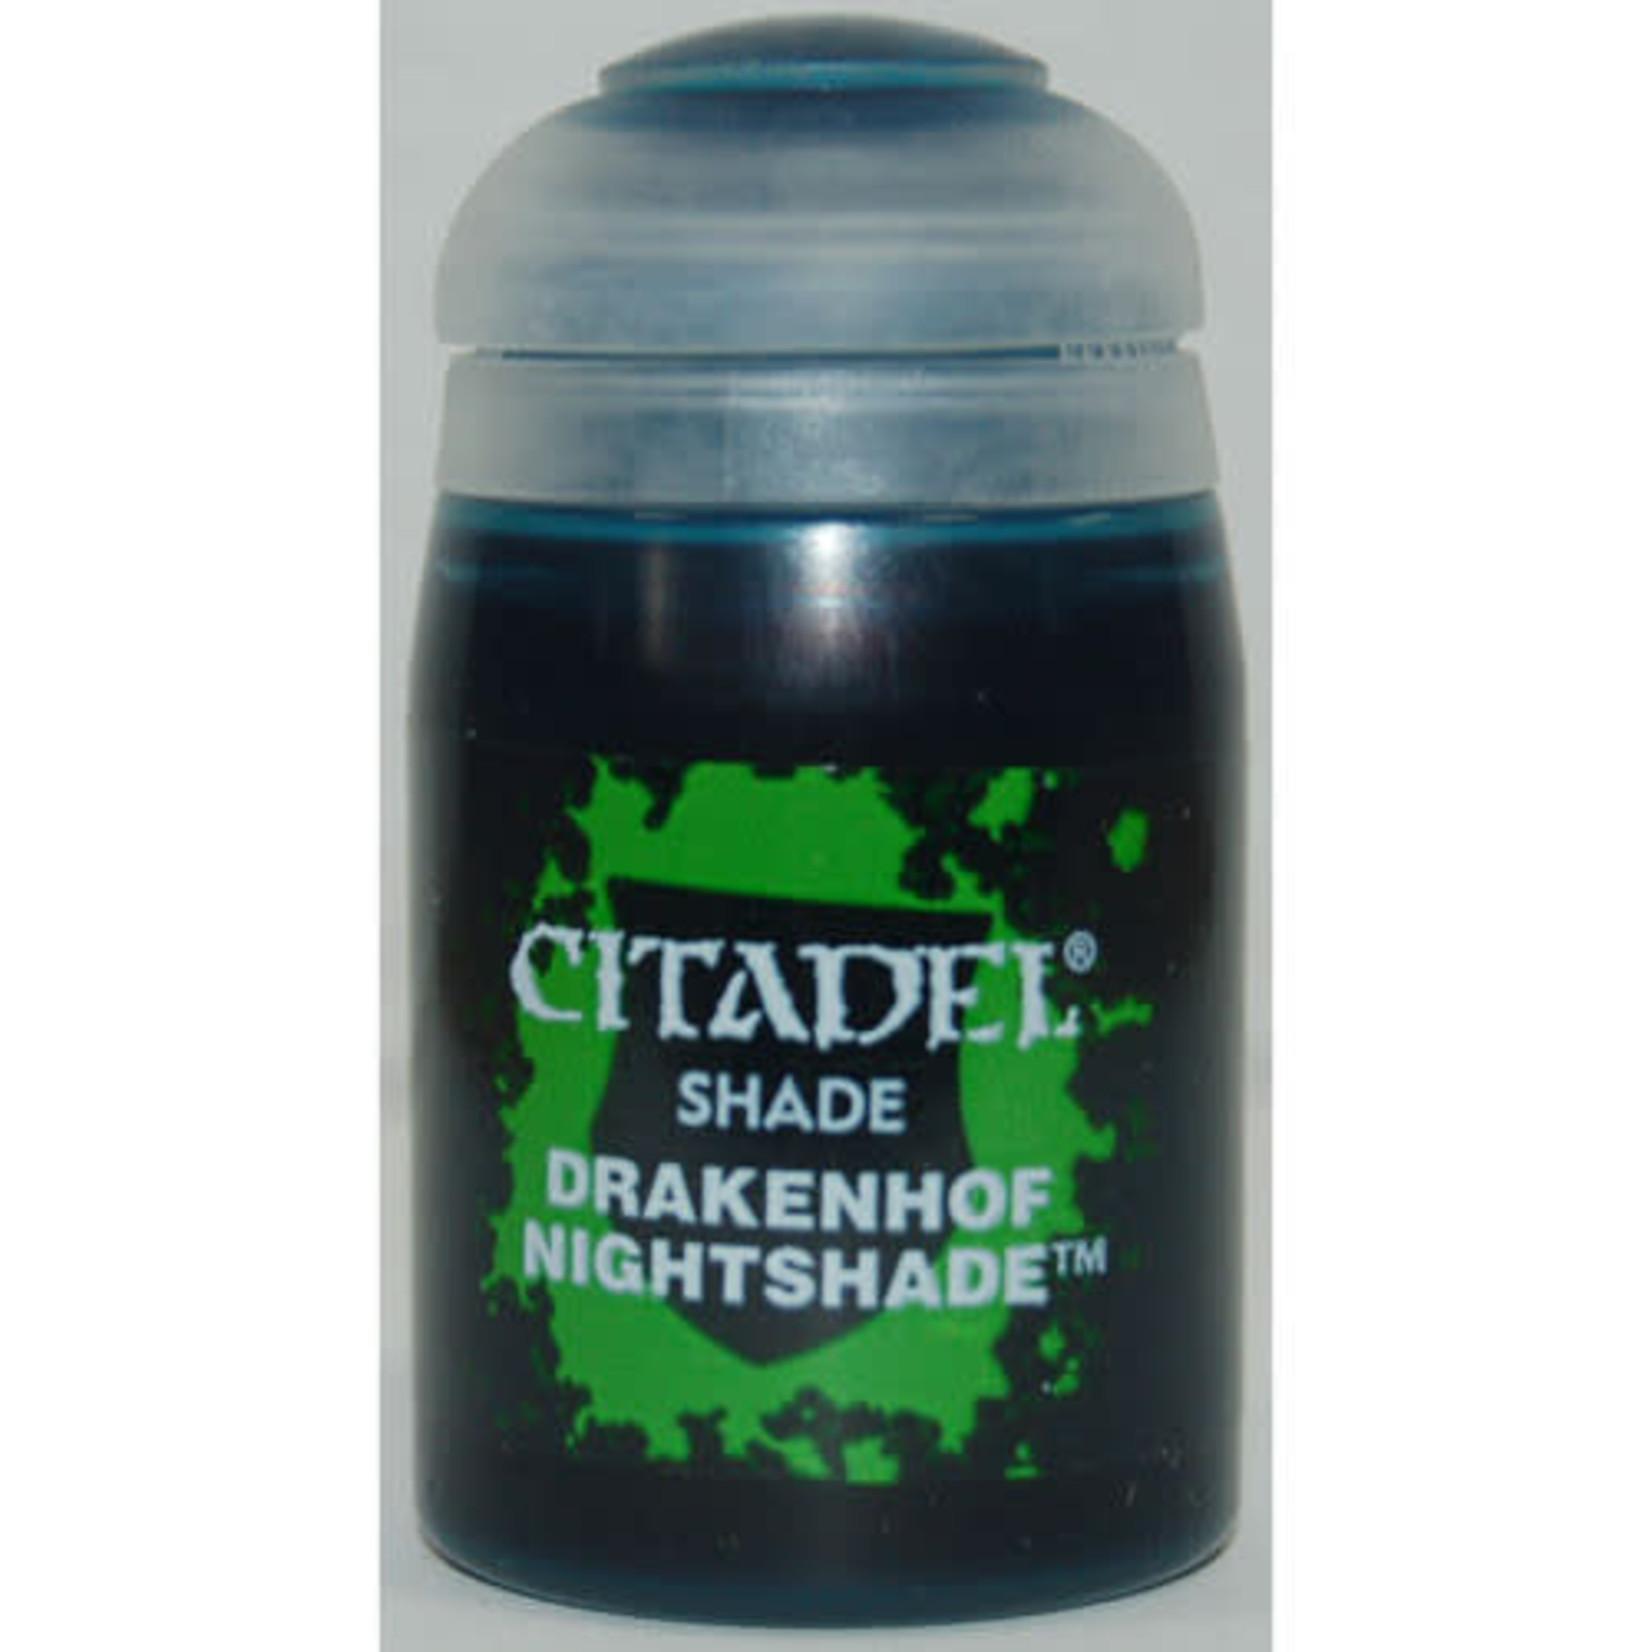 Citadel Citadel Paint - Shade: Drakenhof Nightshade